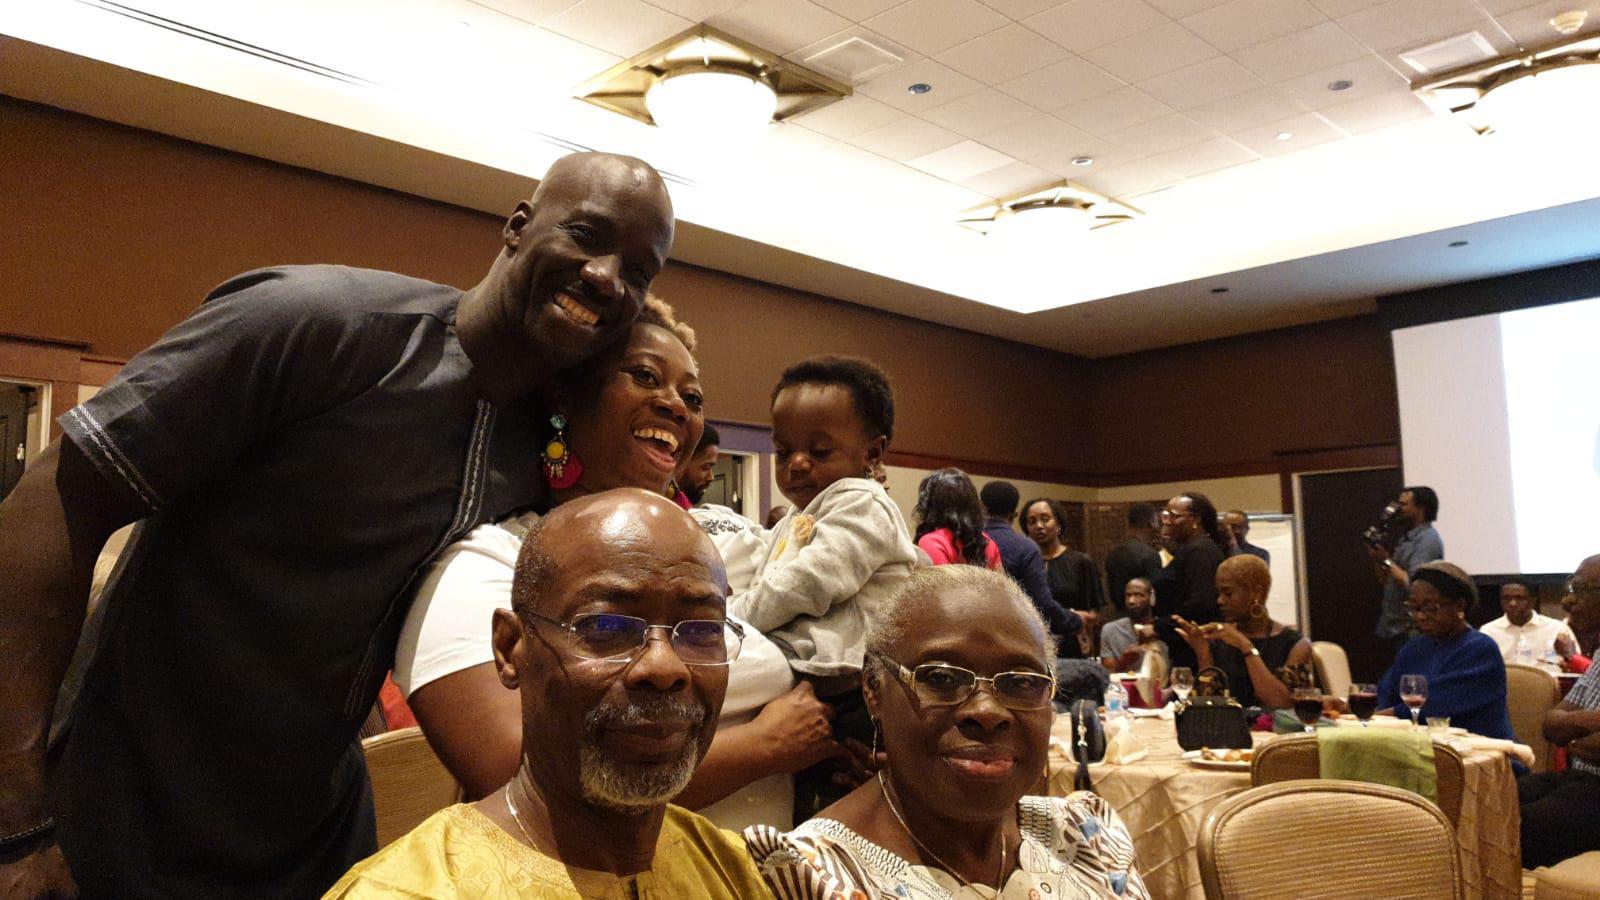 Segun, Temitope & Arenike Sokenu with Uncle Rodney and Mama Kayode. All smiles at Niniola & Seni's pre-wedding party